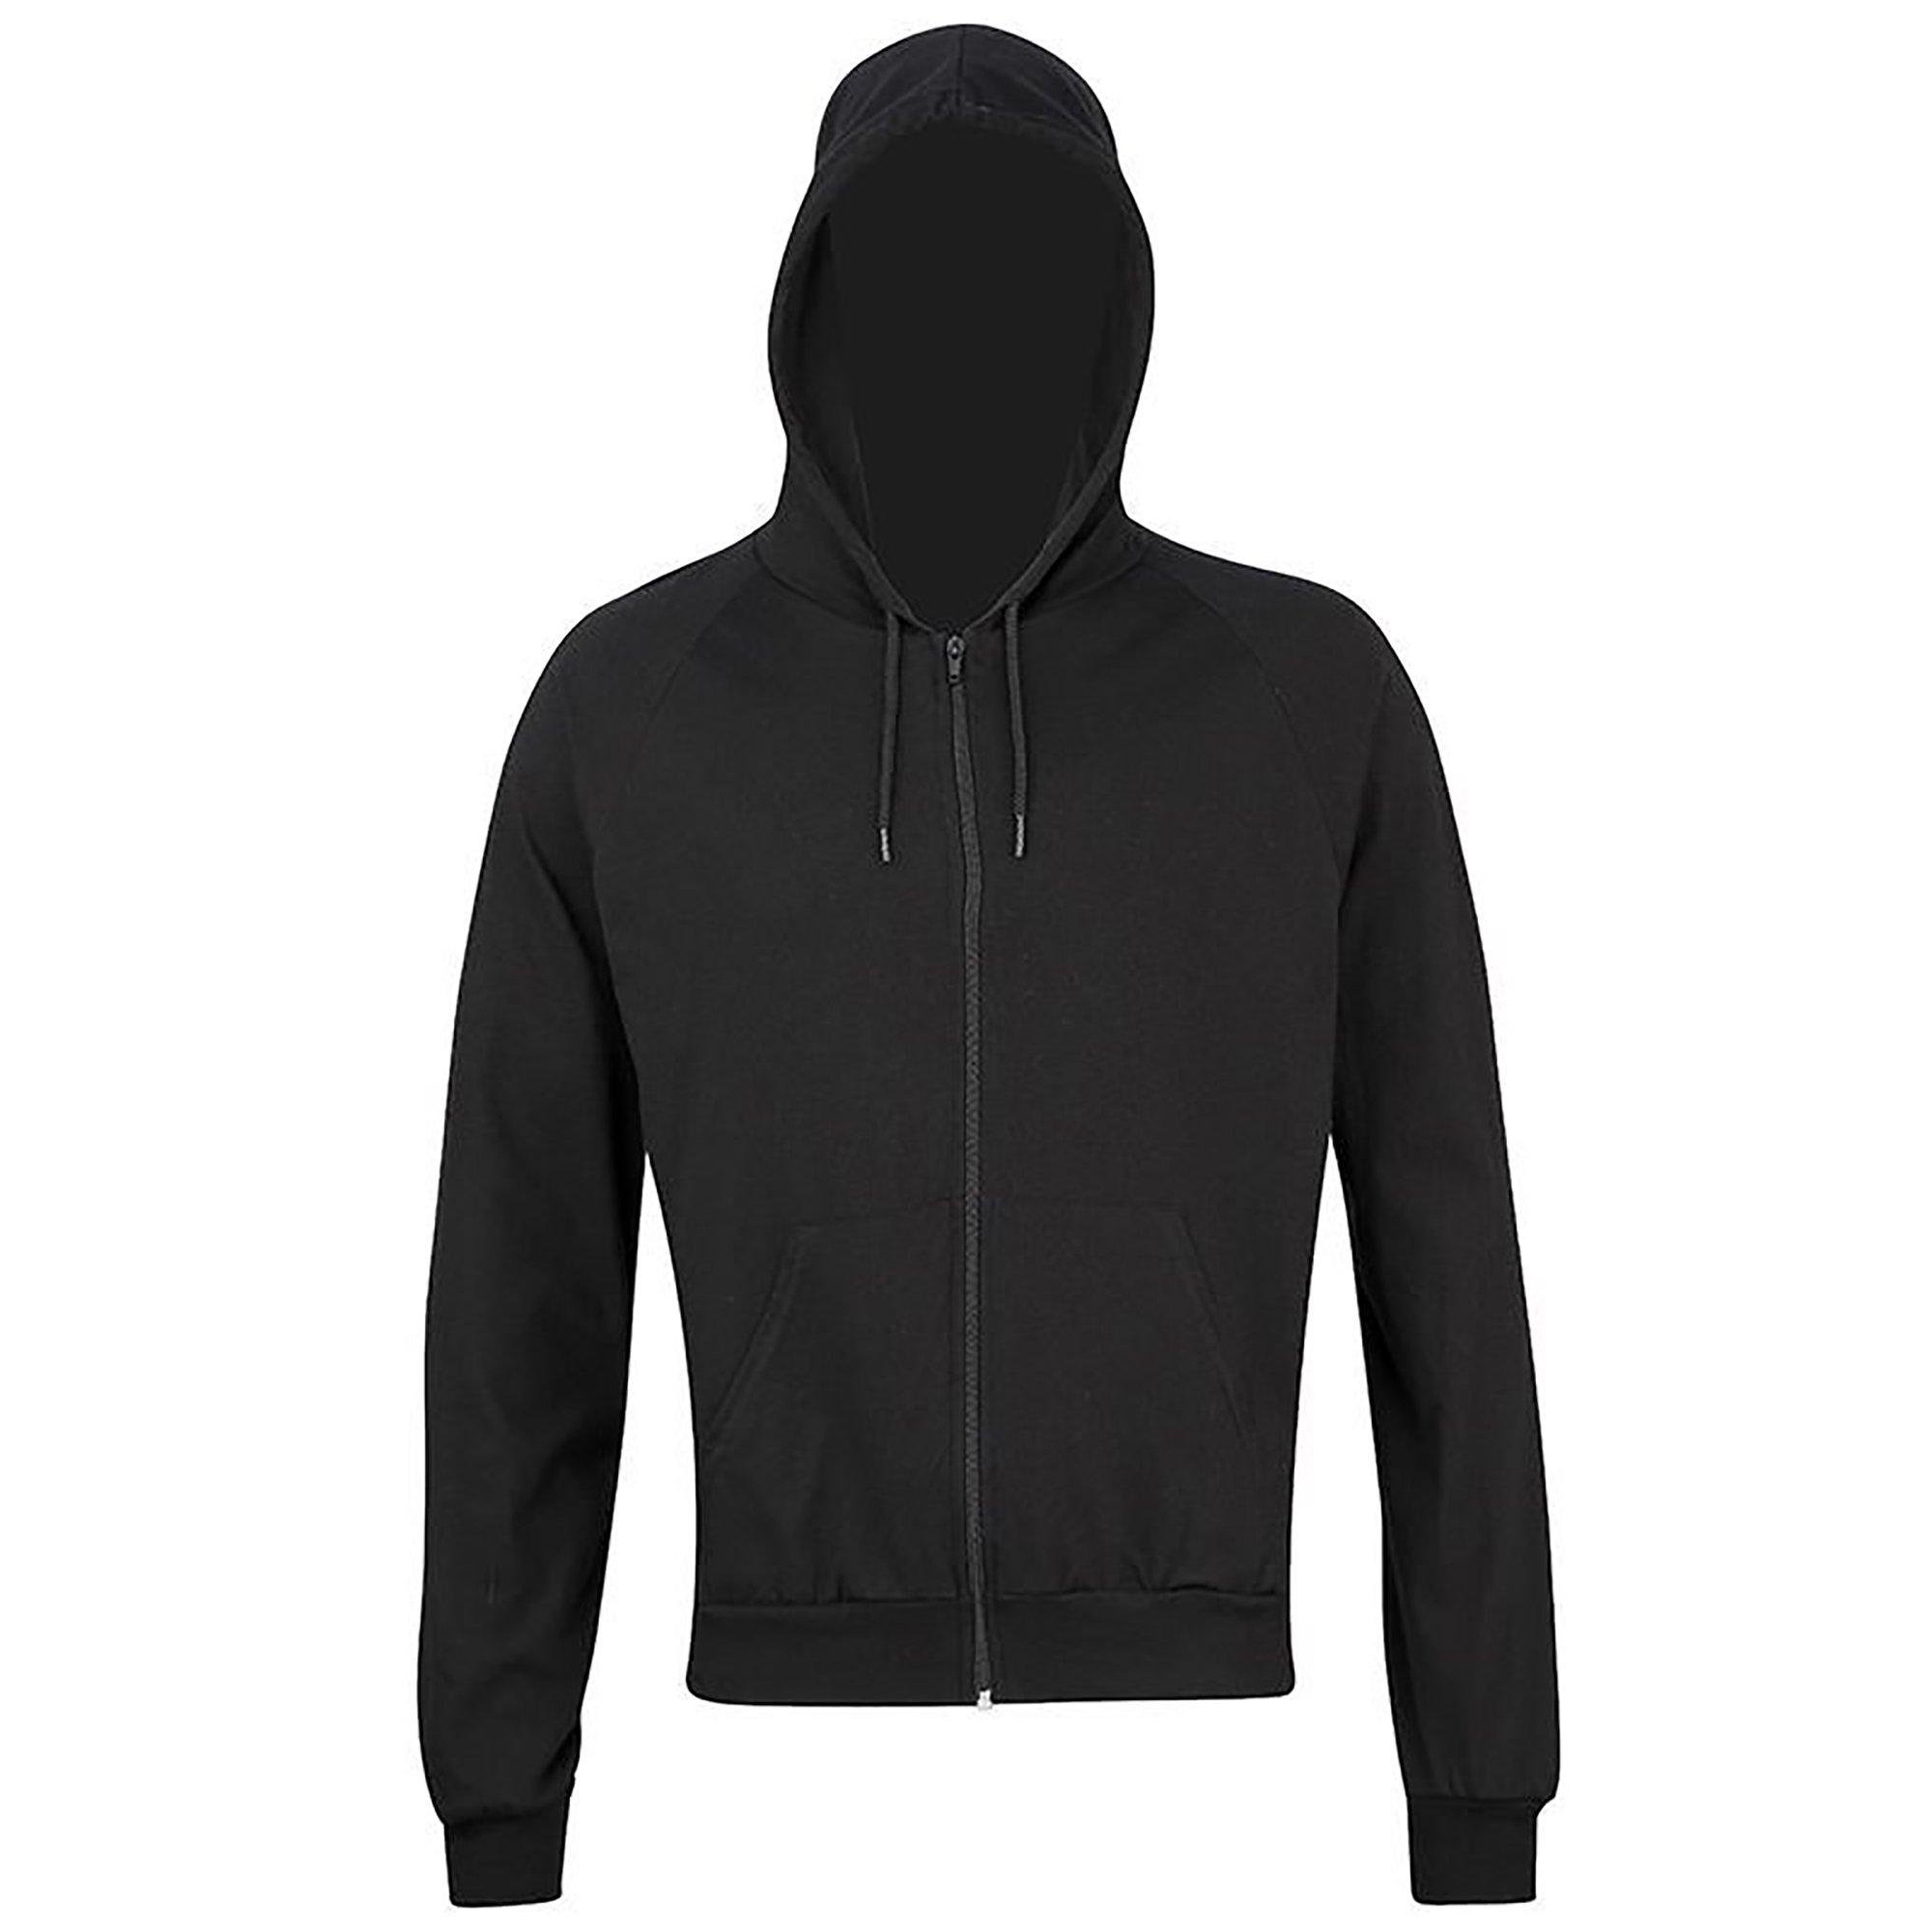 American Apparel Unisex Fine Jersey Zip Hoodie (M) (Black)